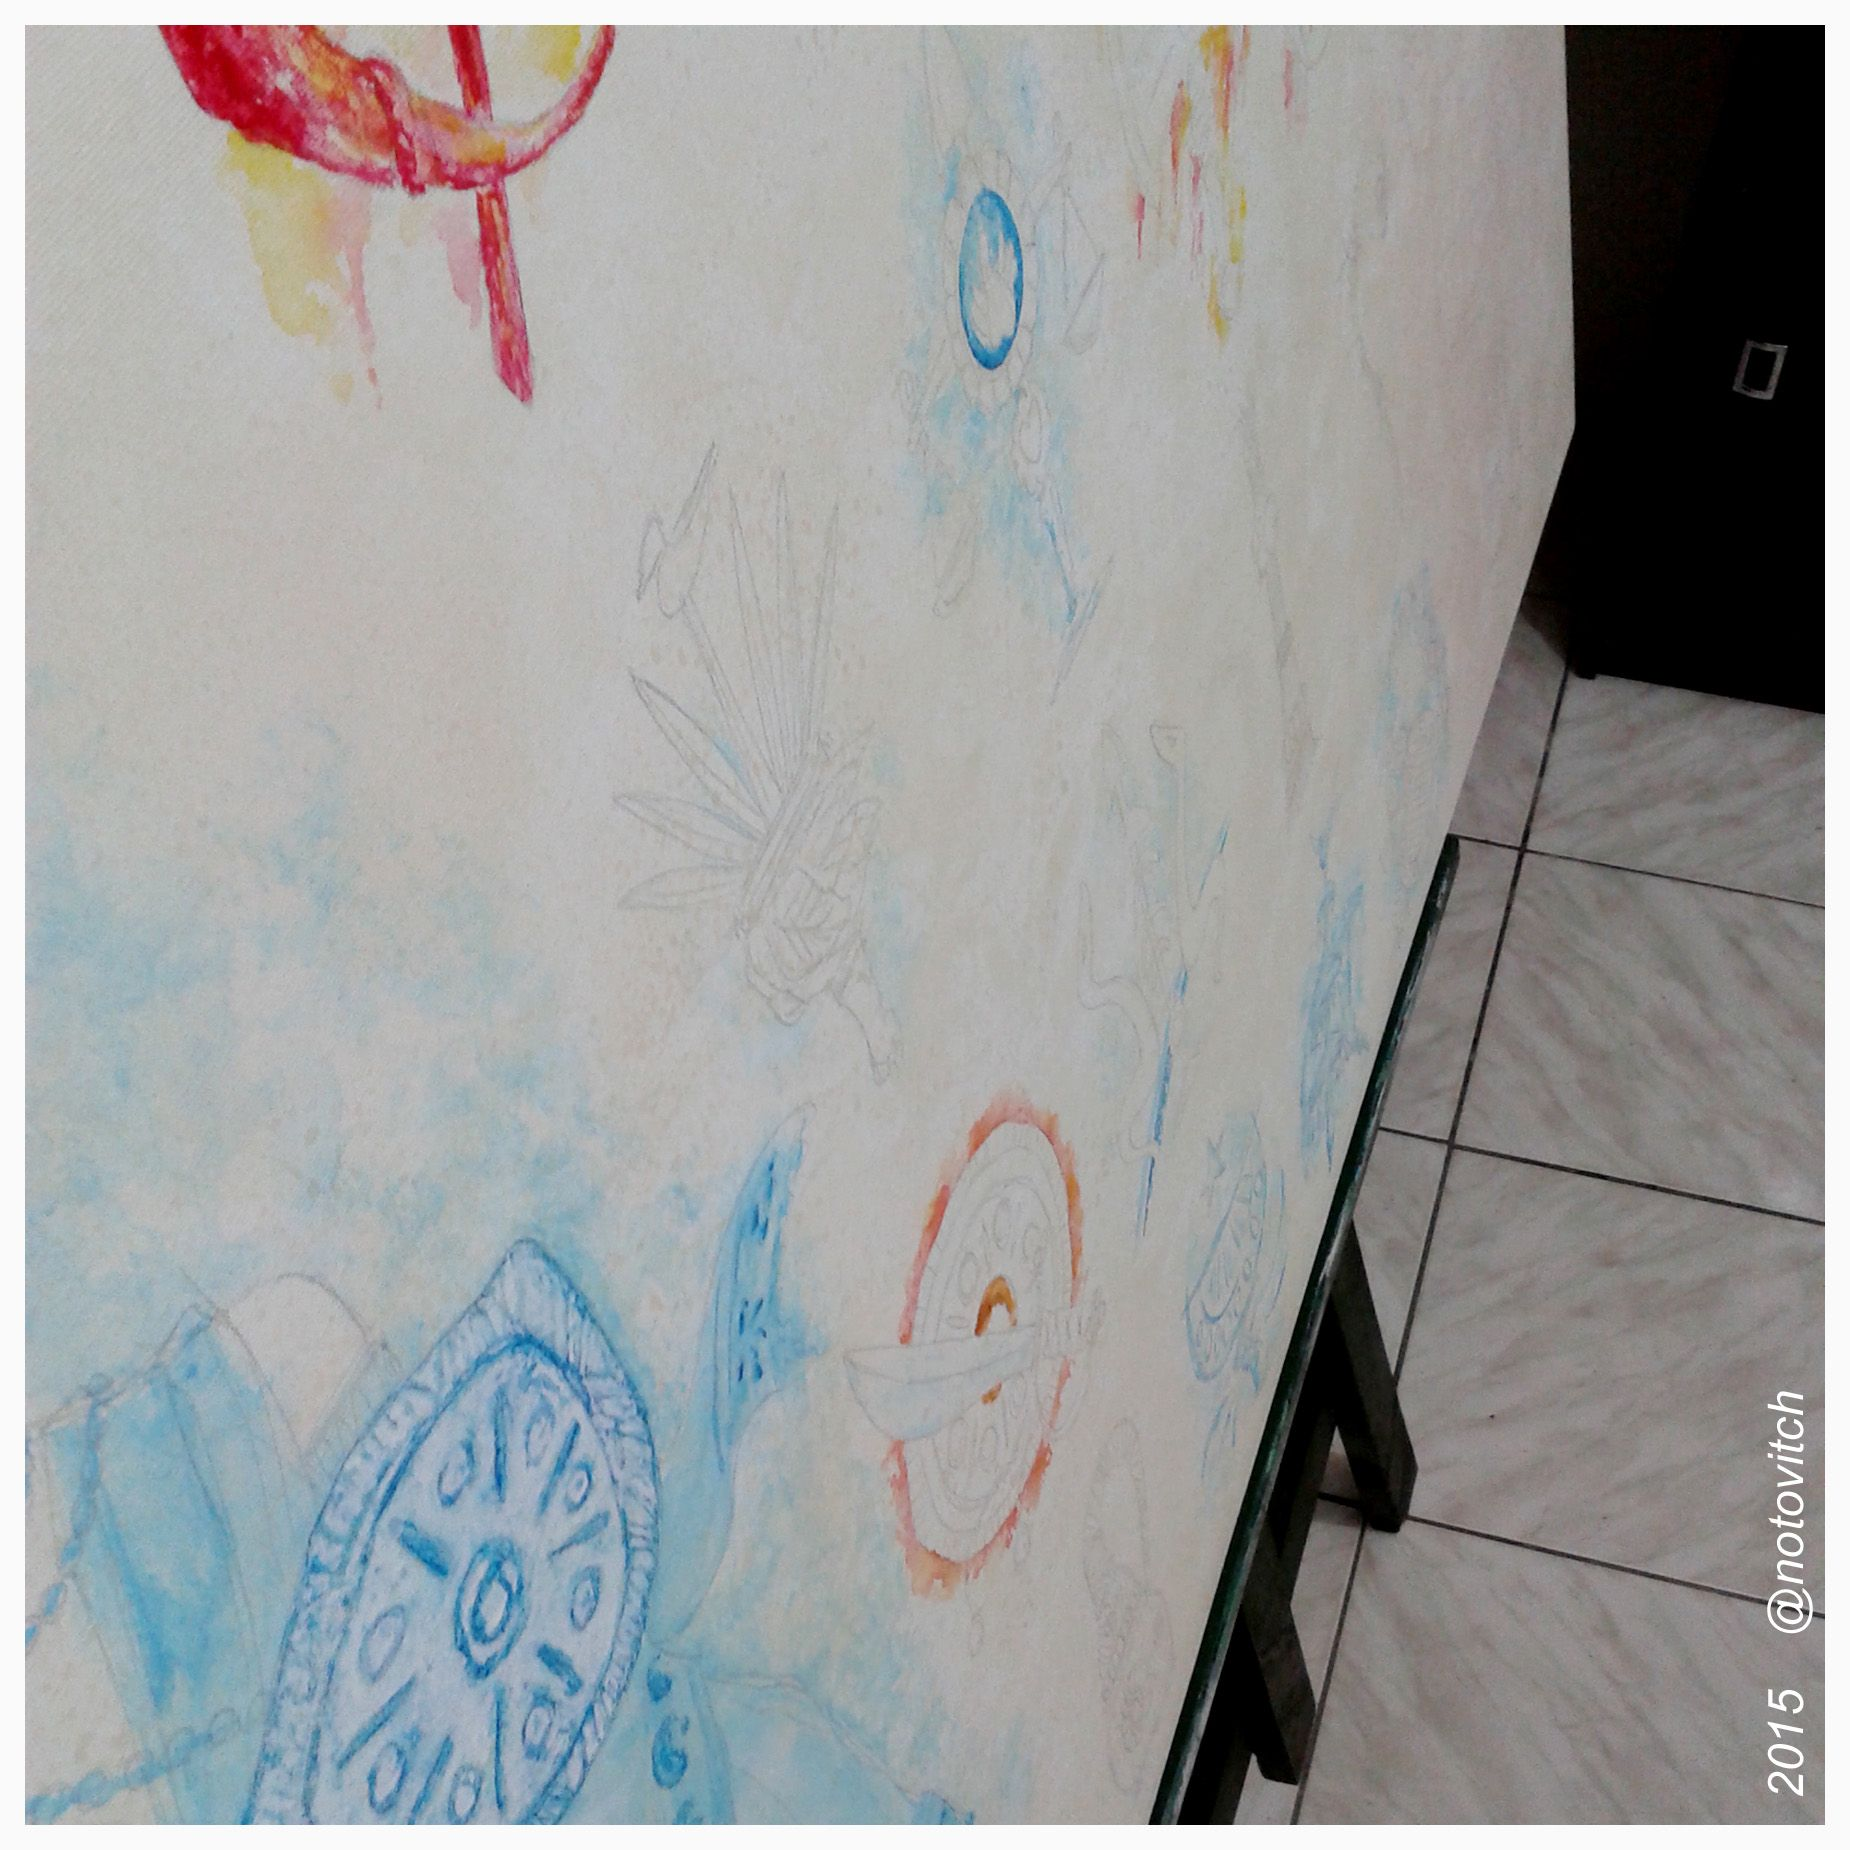 ARTE ENCOMENDADA! Pintando o painel dos Orixás